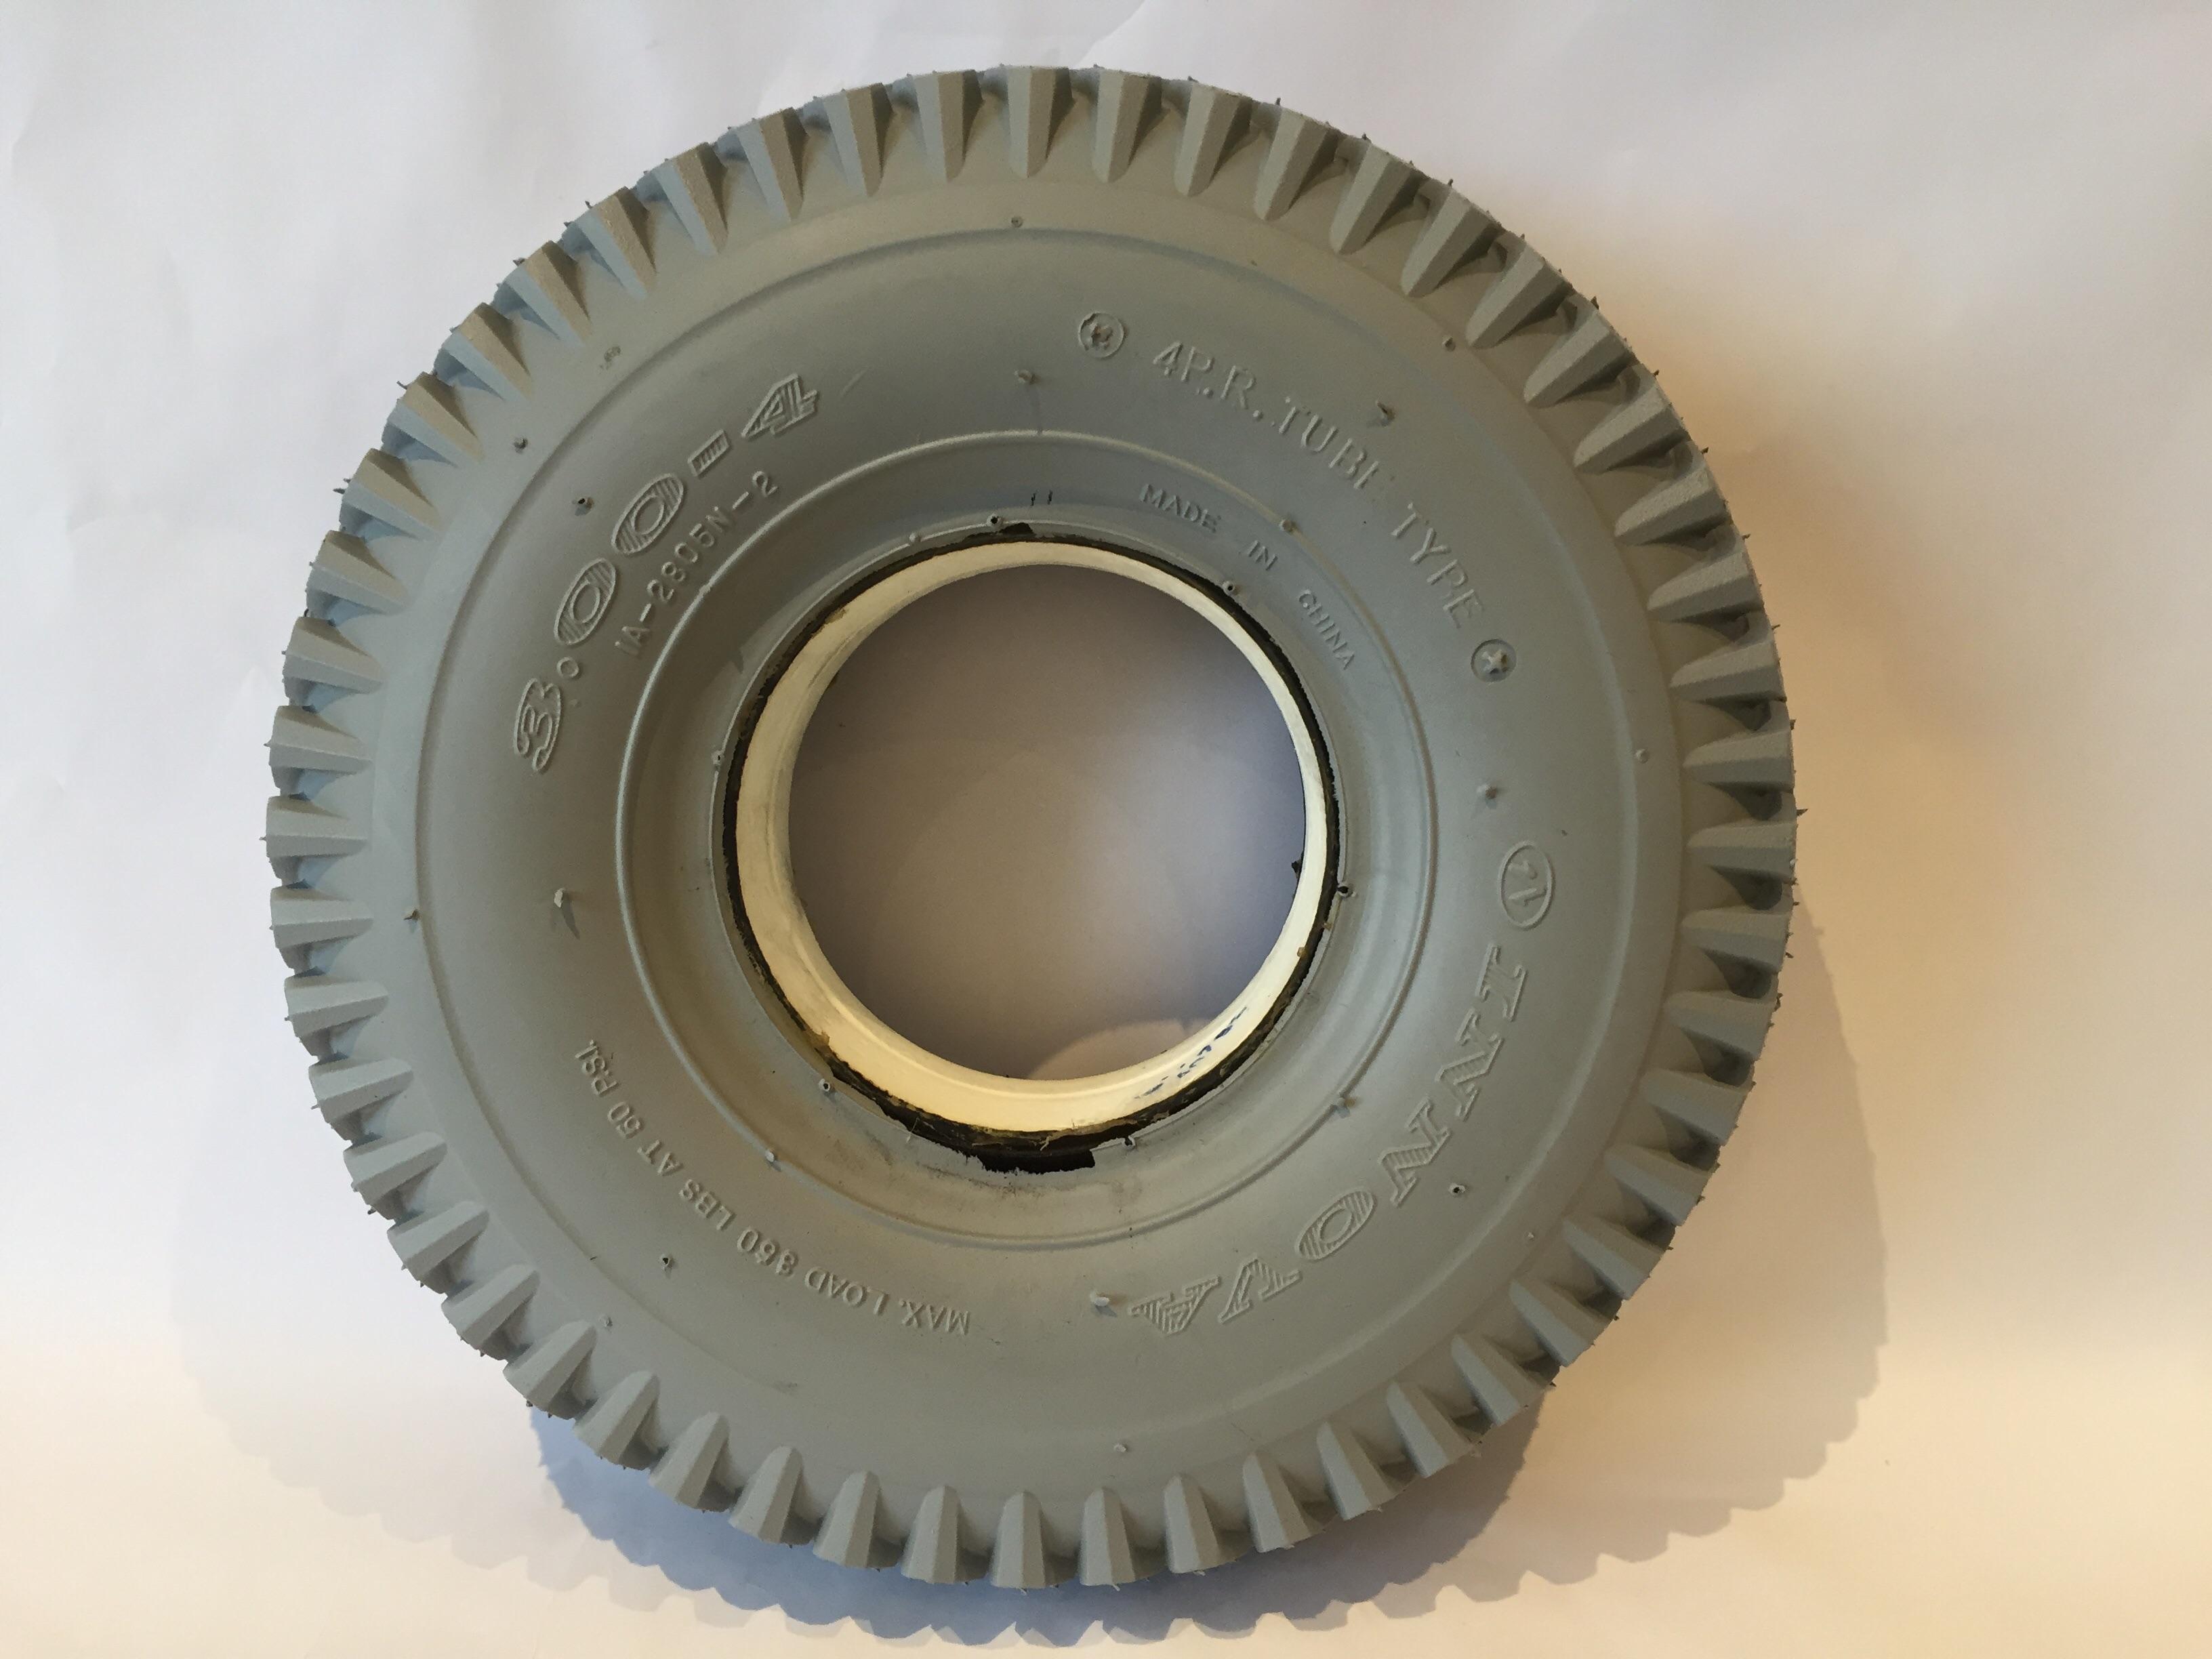 pneu insert 260x85 ou gris crant talon 65 mm x sens mape sarl. Black Bedroom Furniture Sets. Home Design Ideas